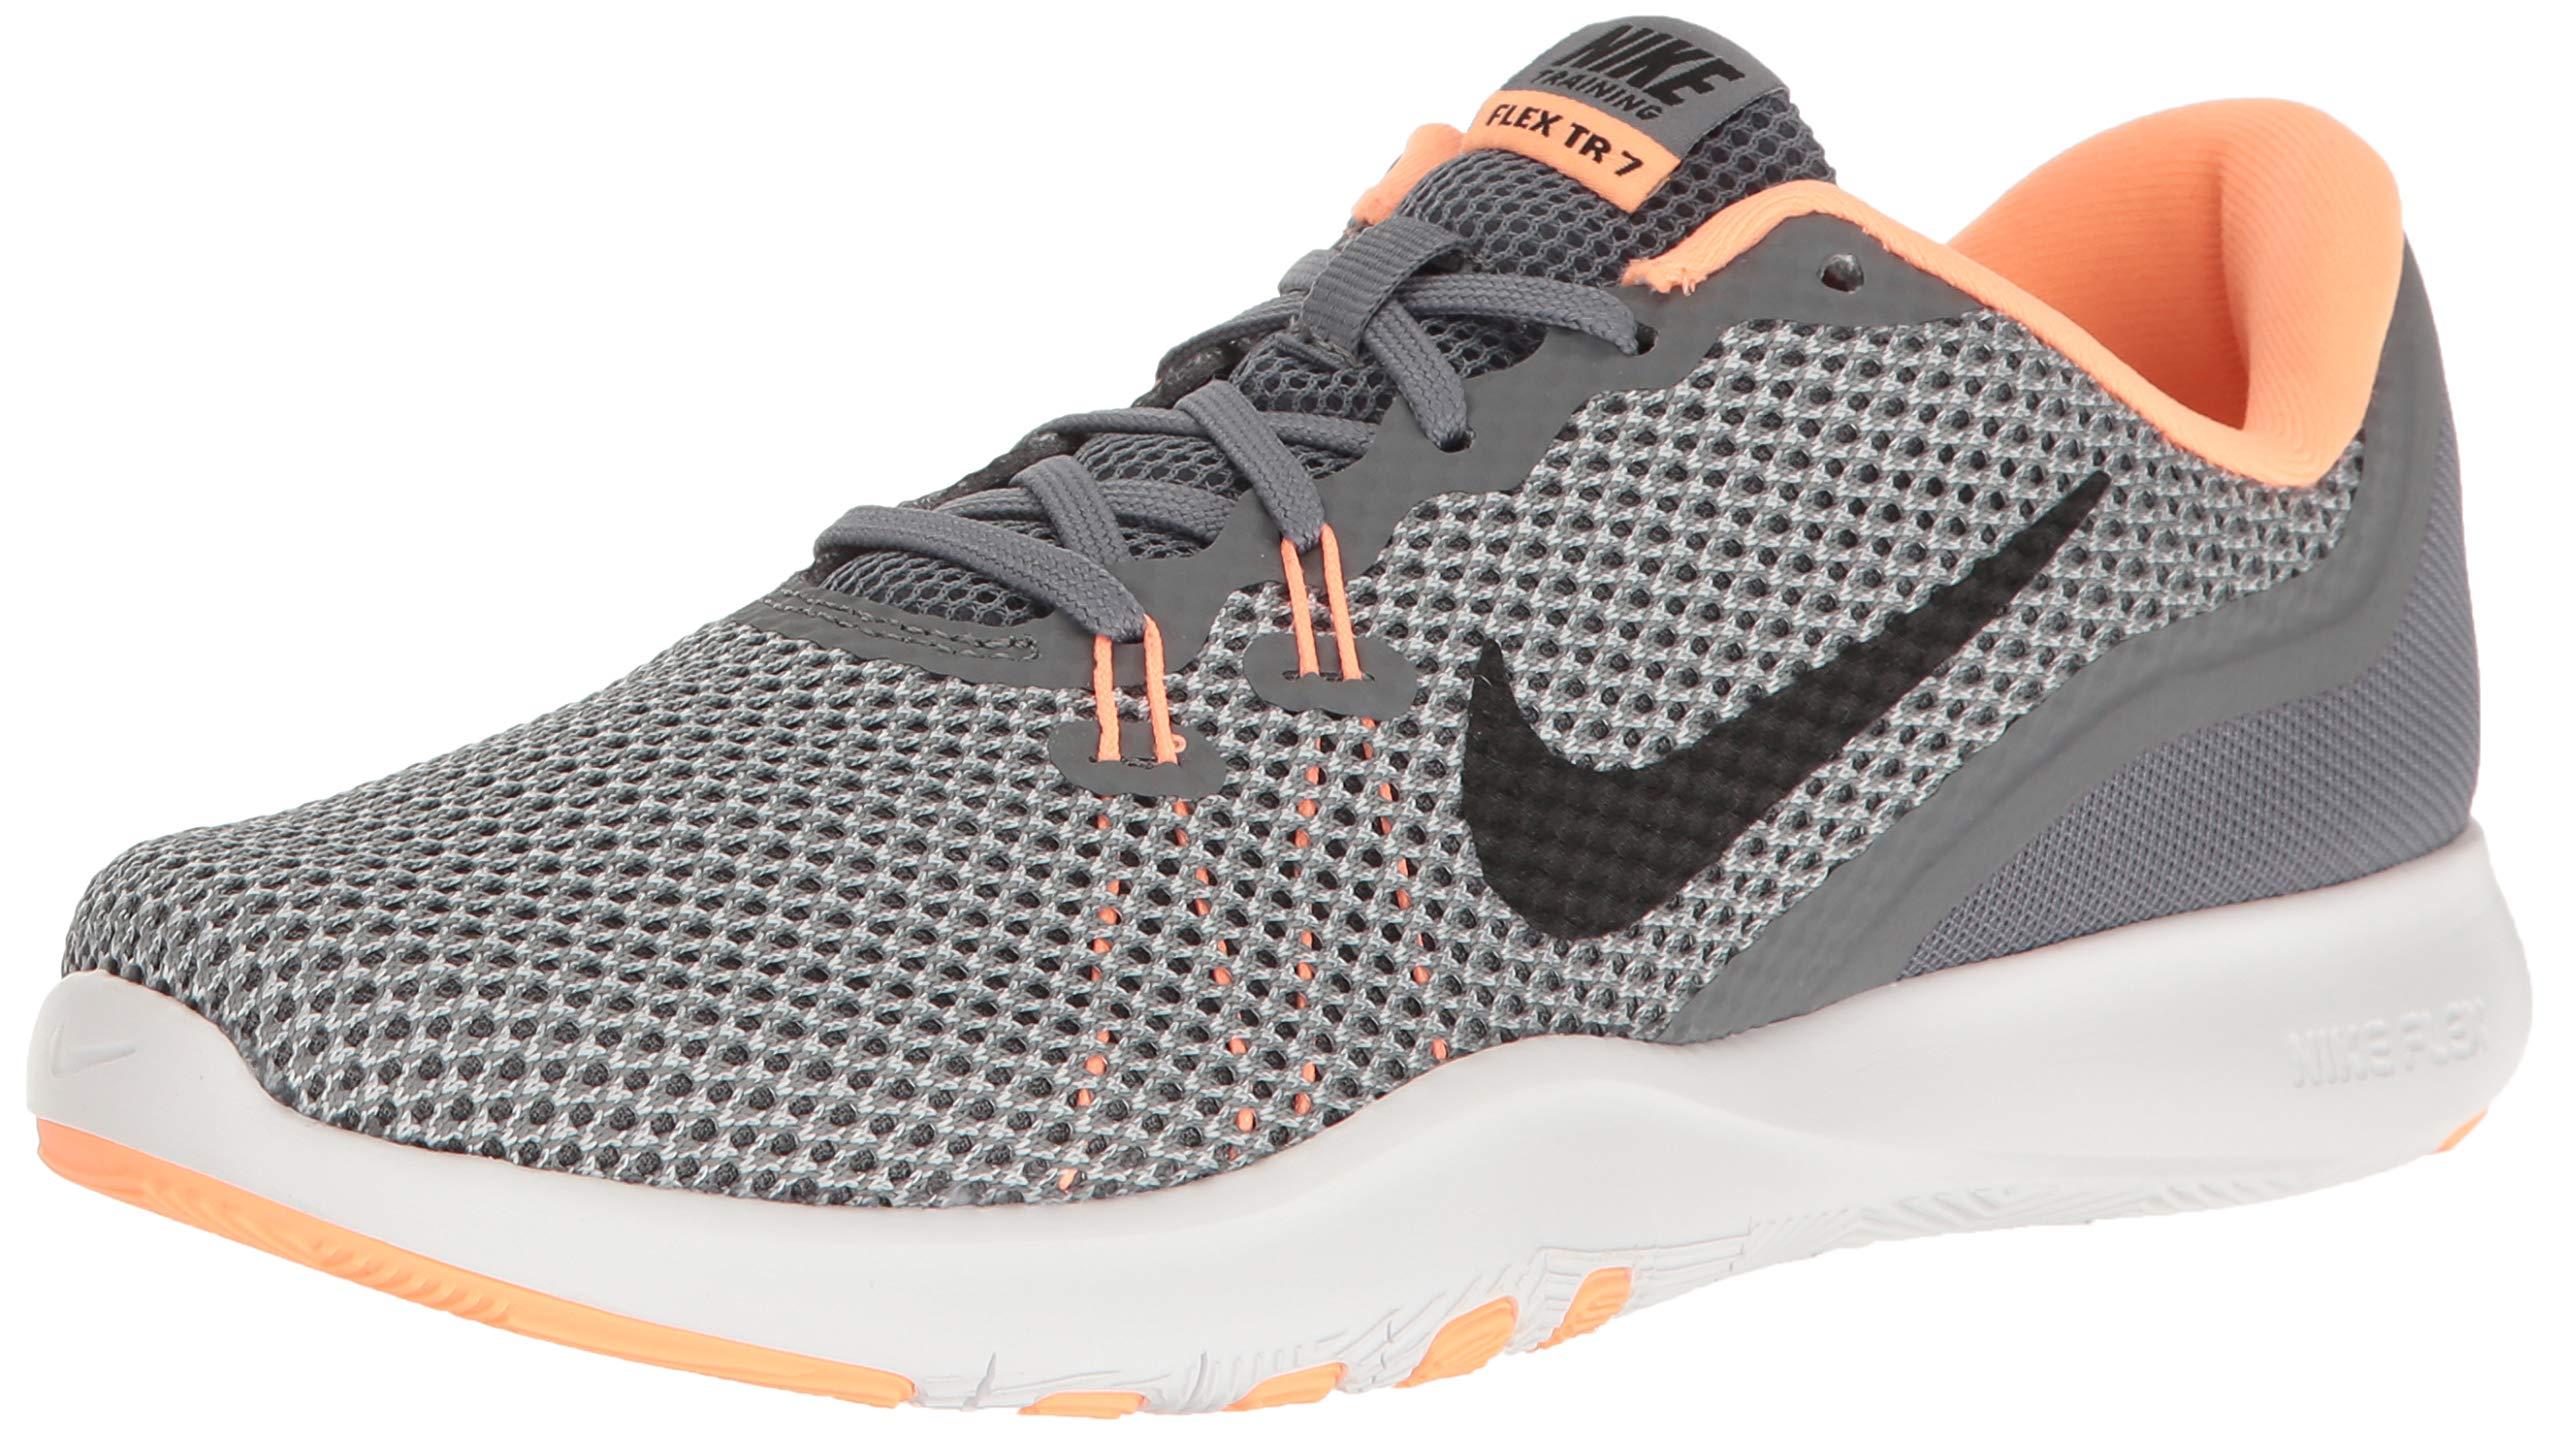 00a16824e1694 NIKE Women's Flex 7 Cross Training Shoe, Cool Grey/Black/Sunset Glow, 6  B(M) US